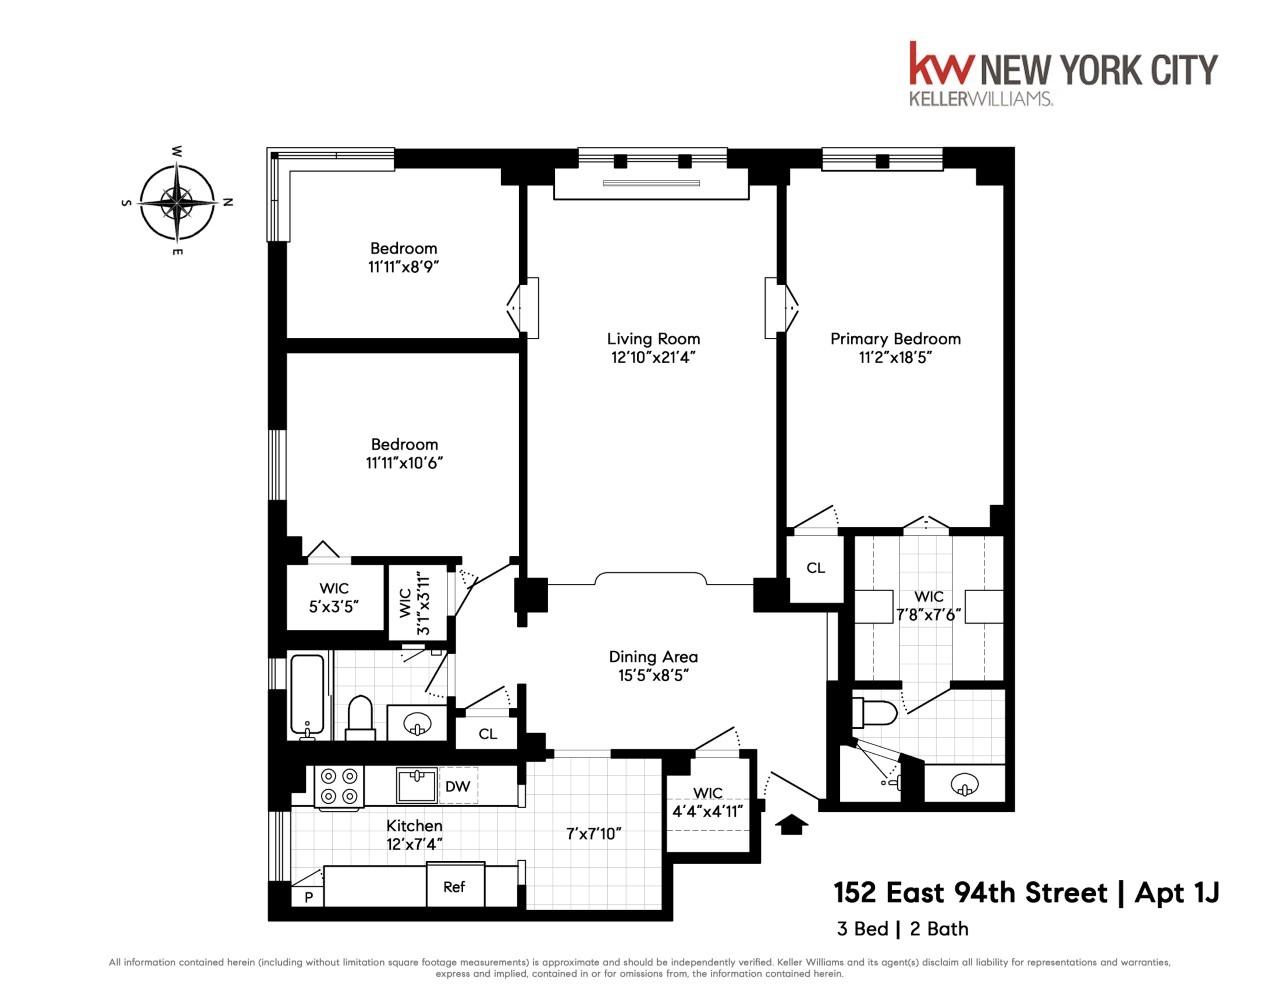 152 East 94th Street Upper East Side New York NY 10128